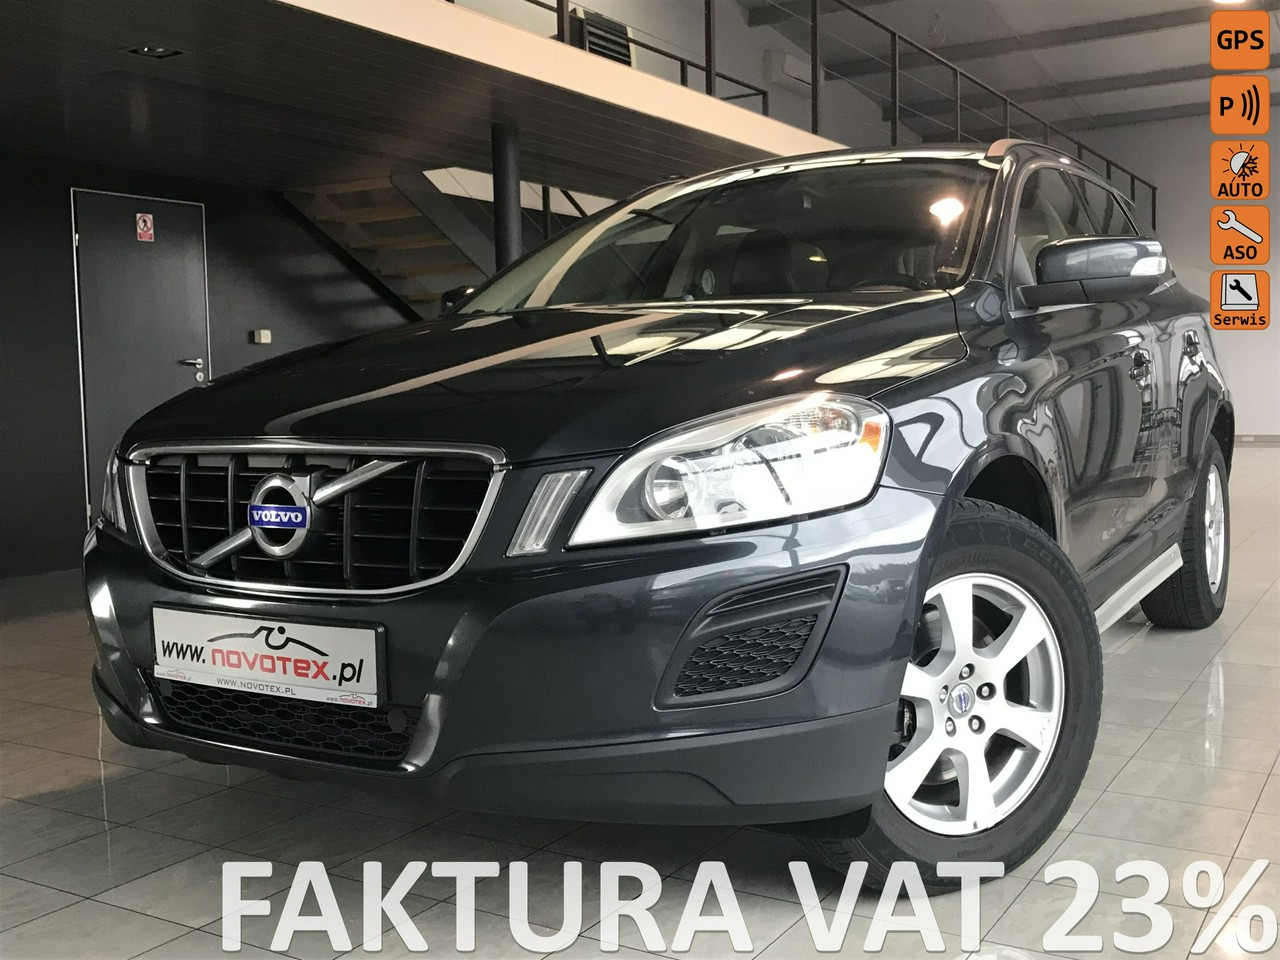 Volvo XC 60 D3*Momentum*automat*navi*ALU*bezwypadek*serwis w ASO*gwarancja VIP